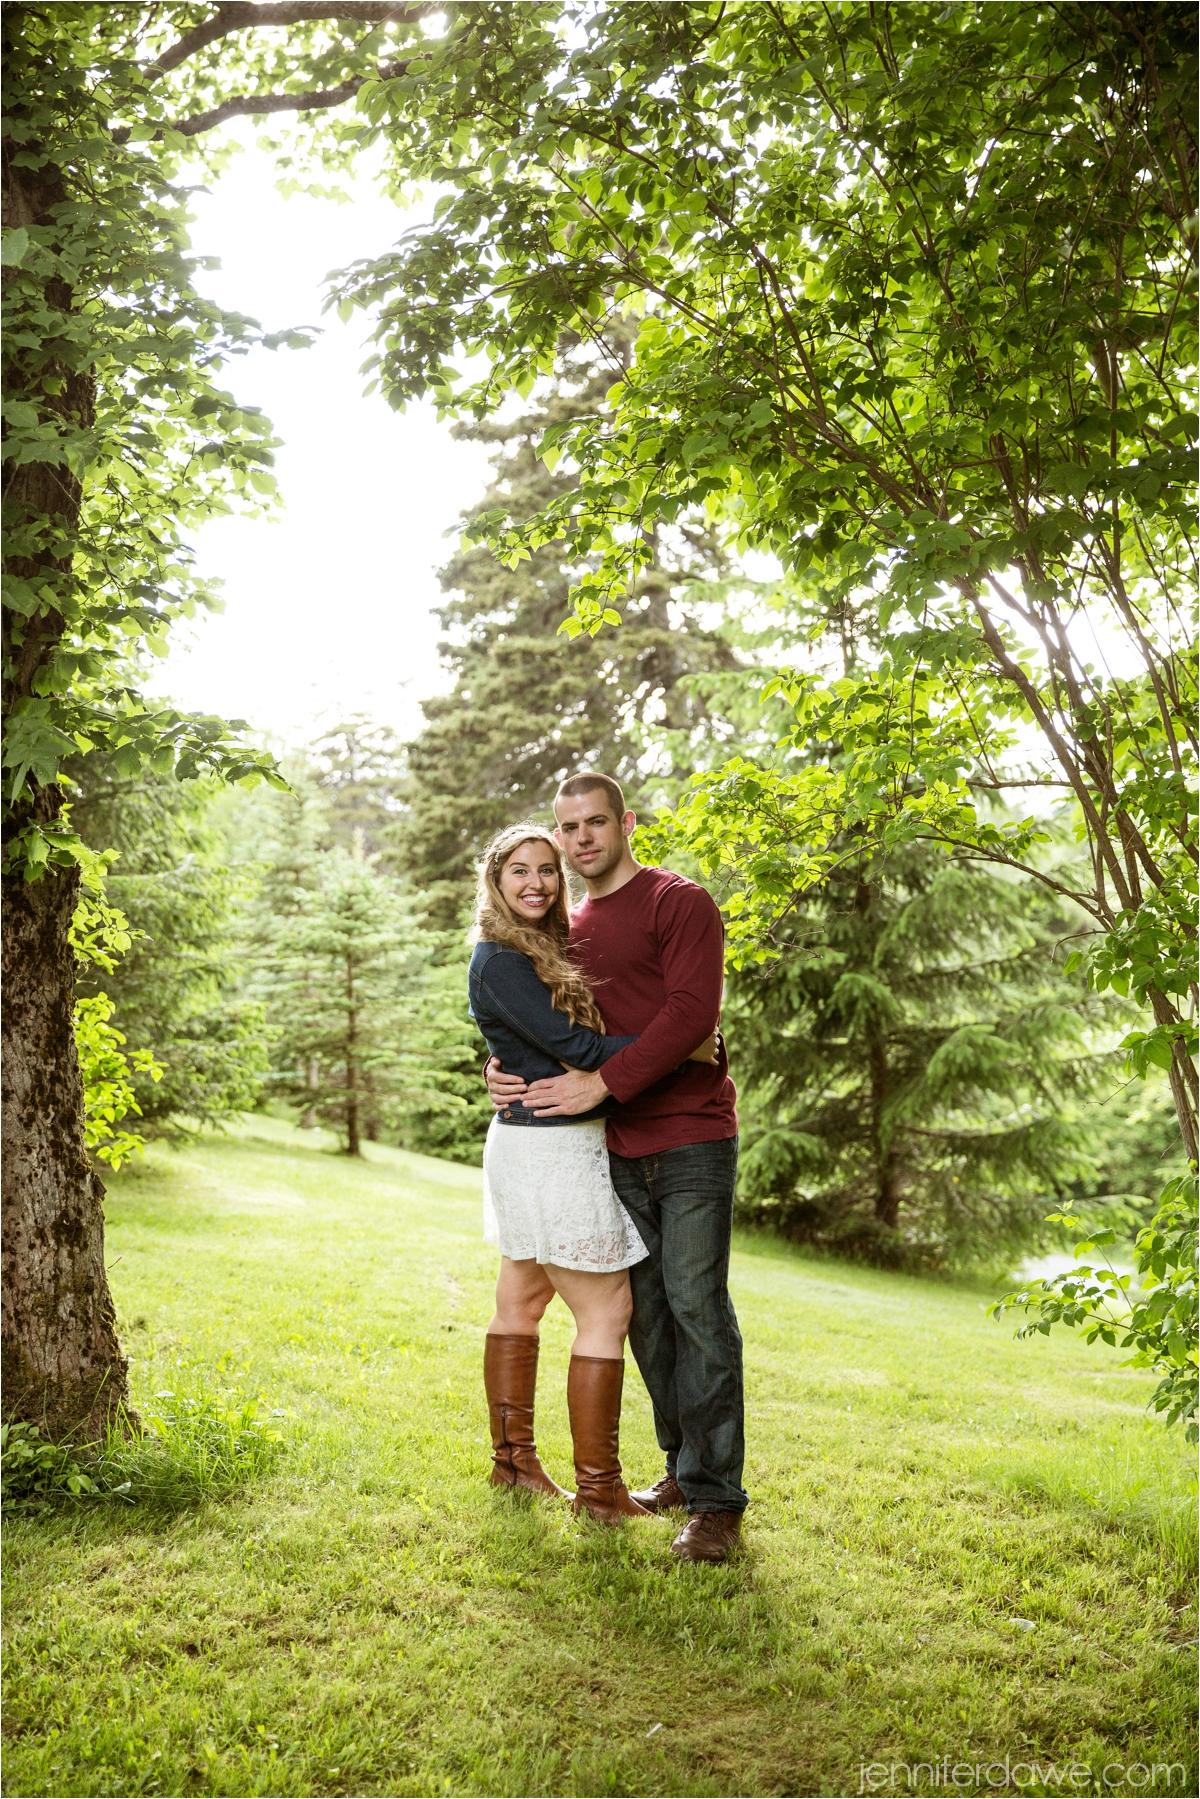 Jennifer Dawe Photography Newfoundland Wedding Photographers Best Newfoundland Photographer St John's NL Wedding Manuels River Wedding_3621